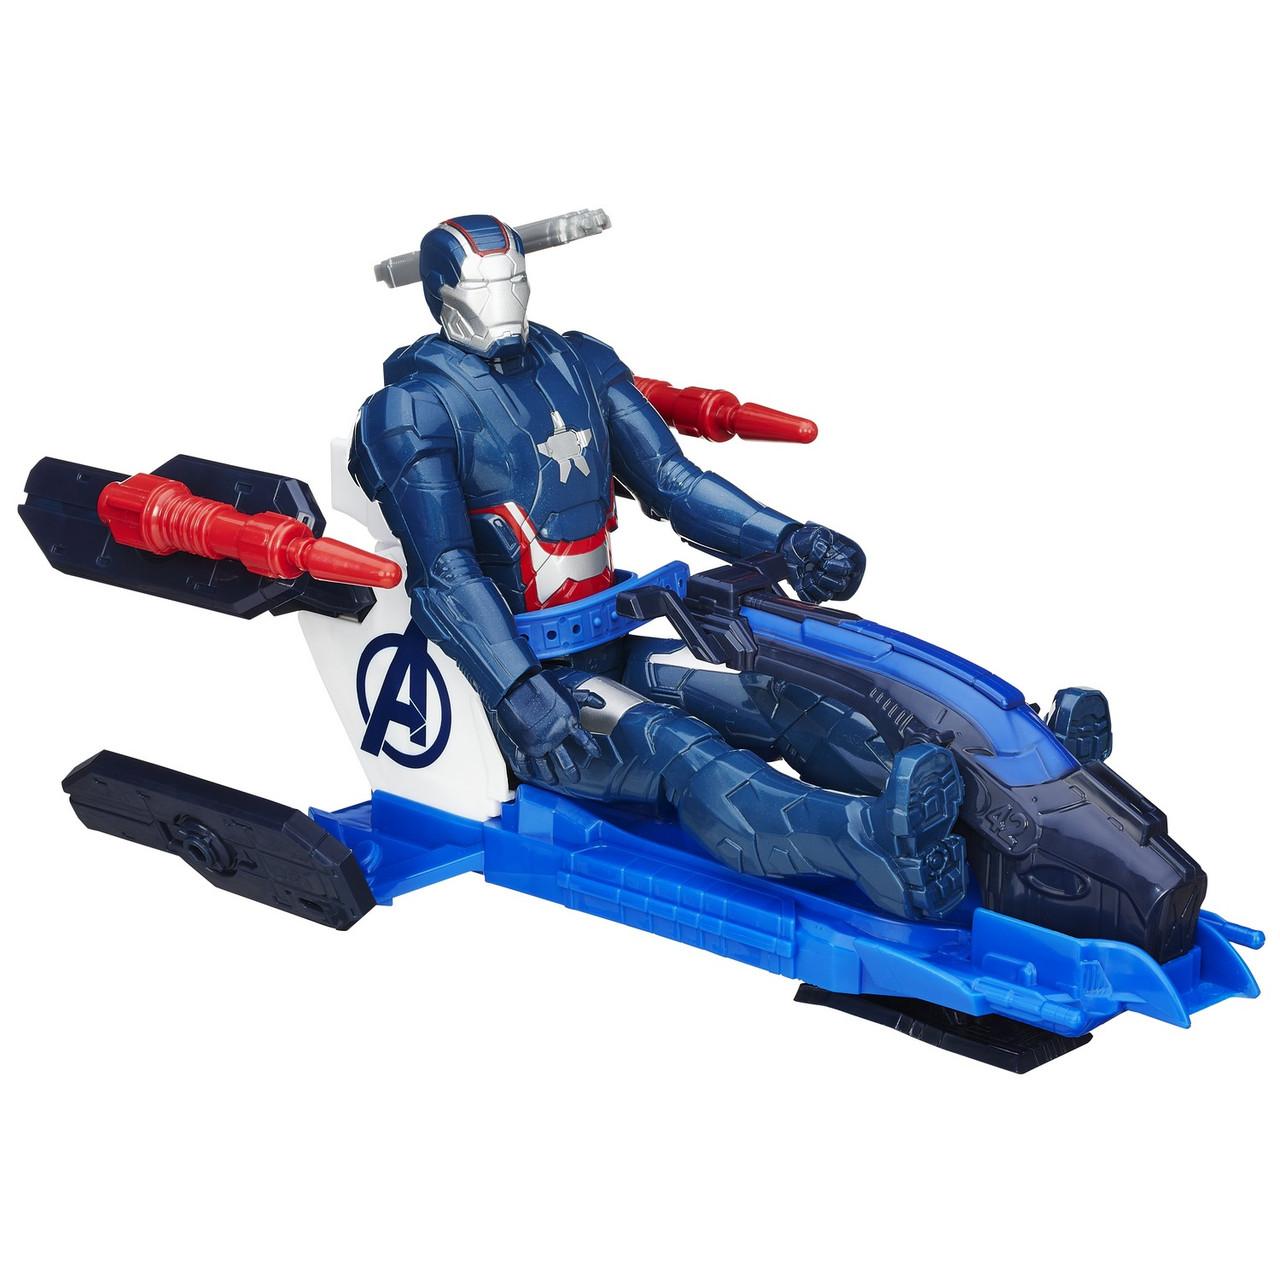 Железный Патриот на автомобилем  30СМ - Iron Patriot, Titans, Avengers, Hasbro